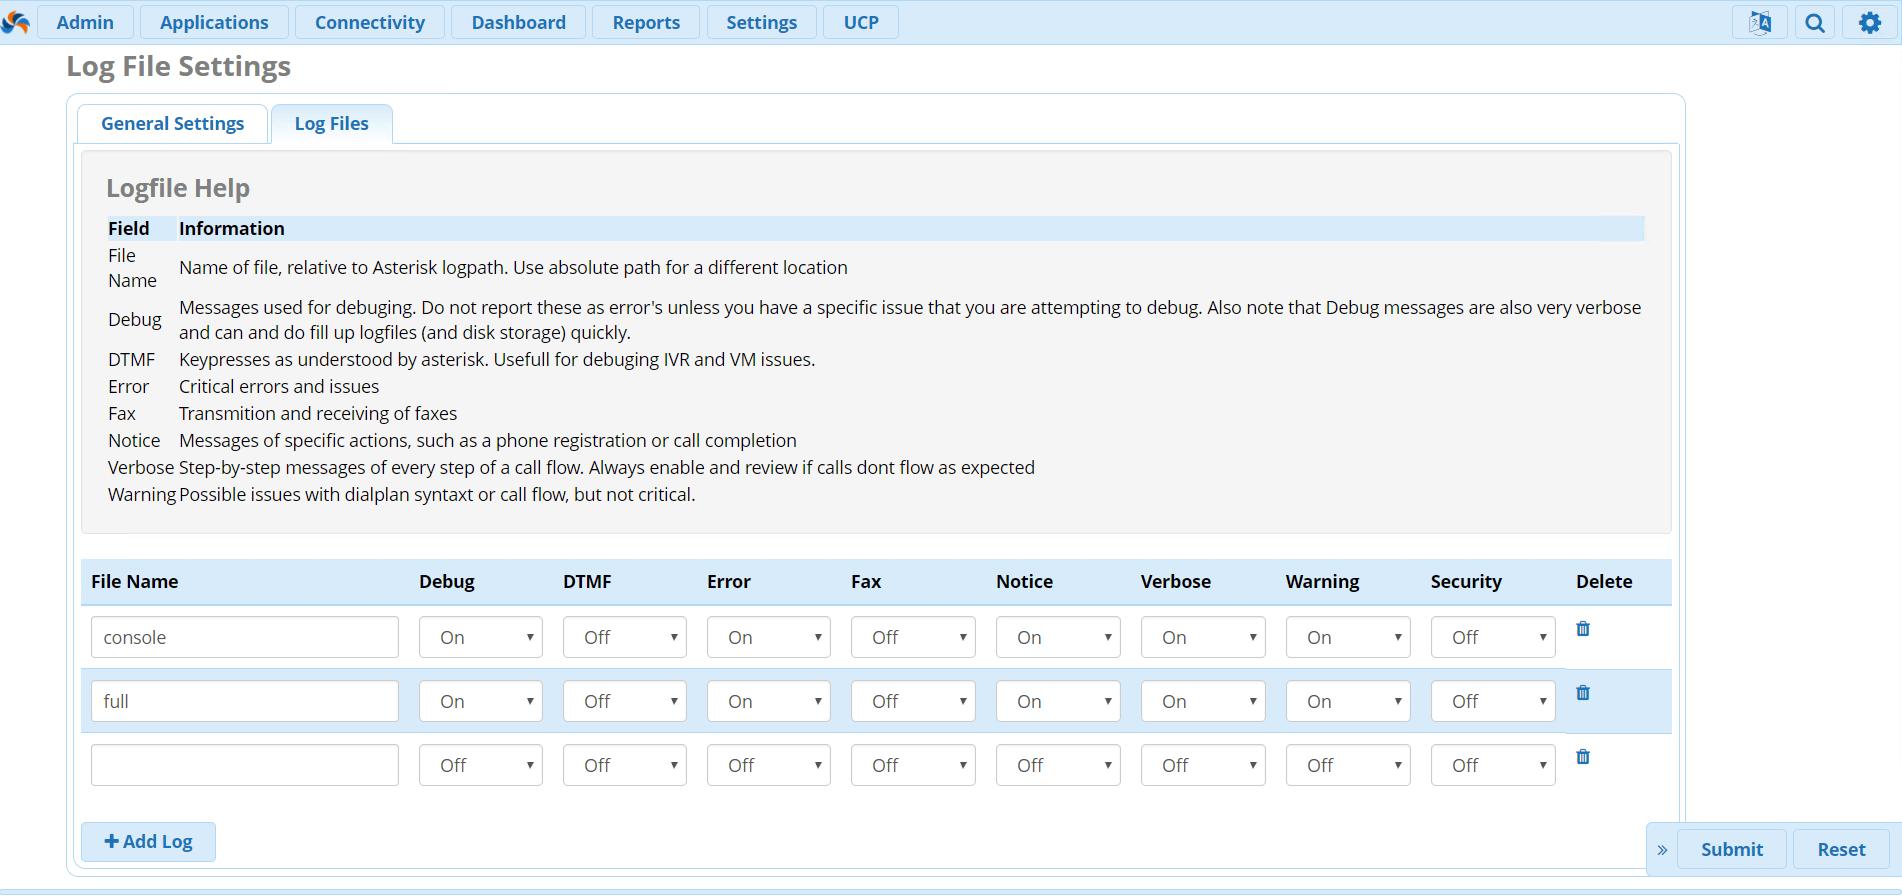 Опции настройки модуля Asterisk Logfile Settings